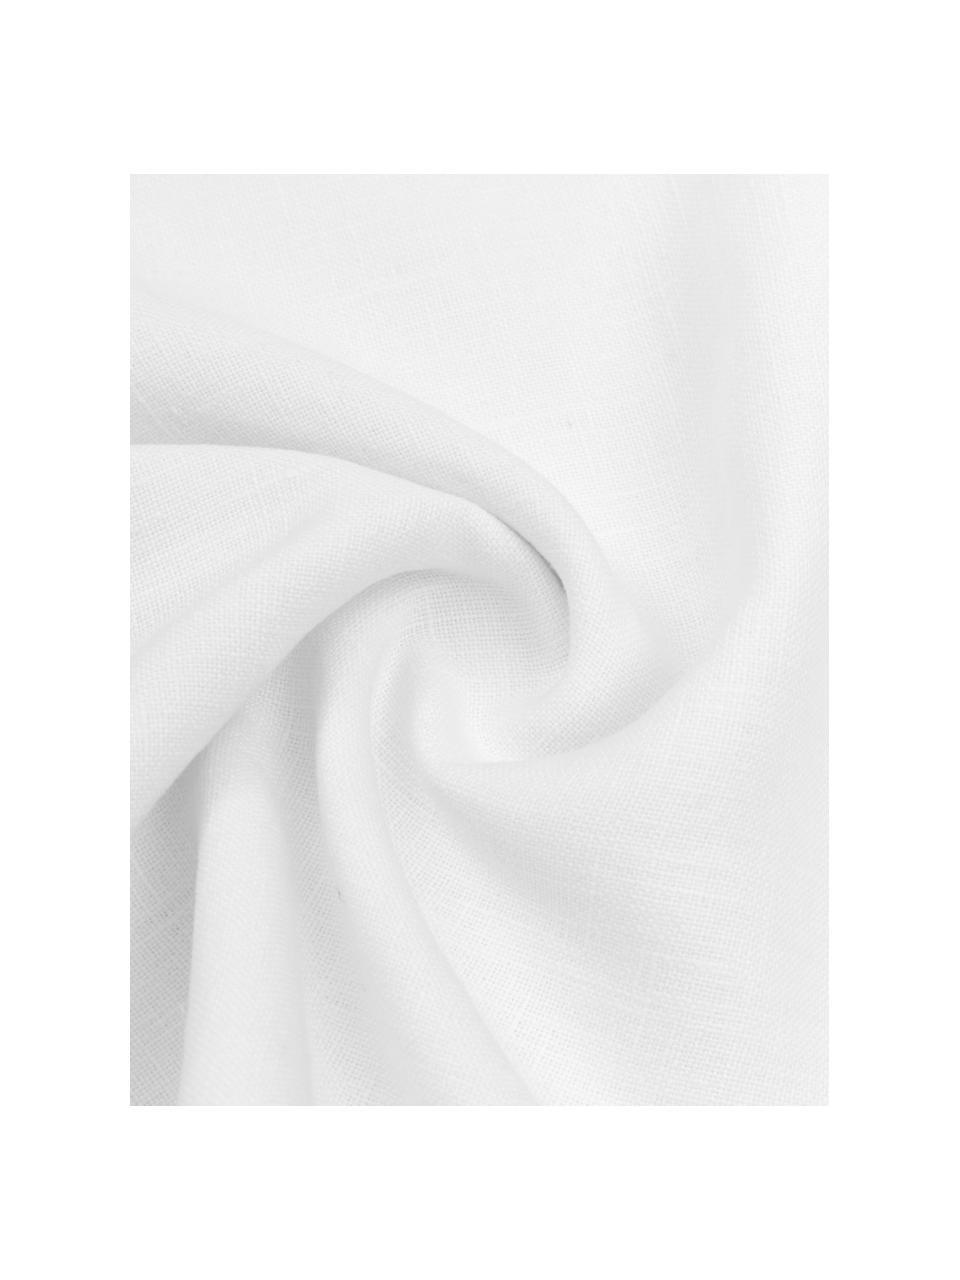 Linnen kussenhoes Luana in crèmewit met franjes, 100% linnen, Crèmewit, 50 x 50 cm